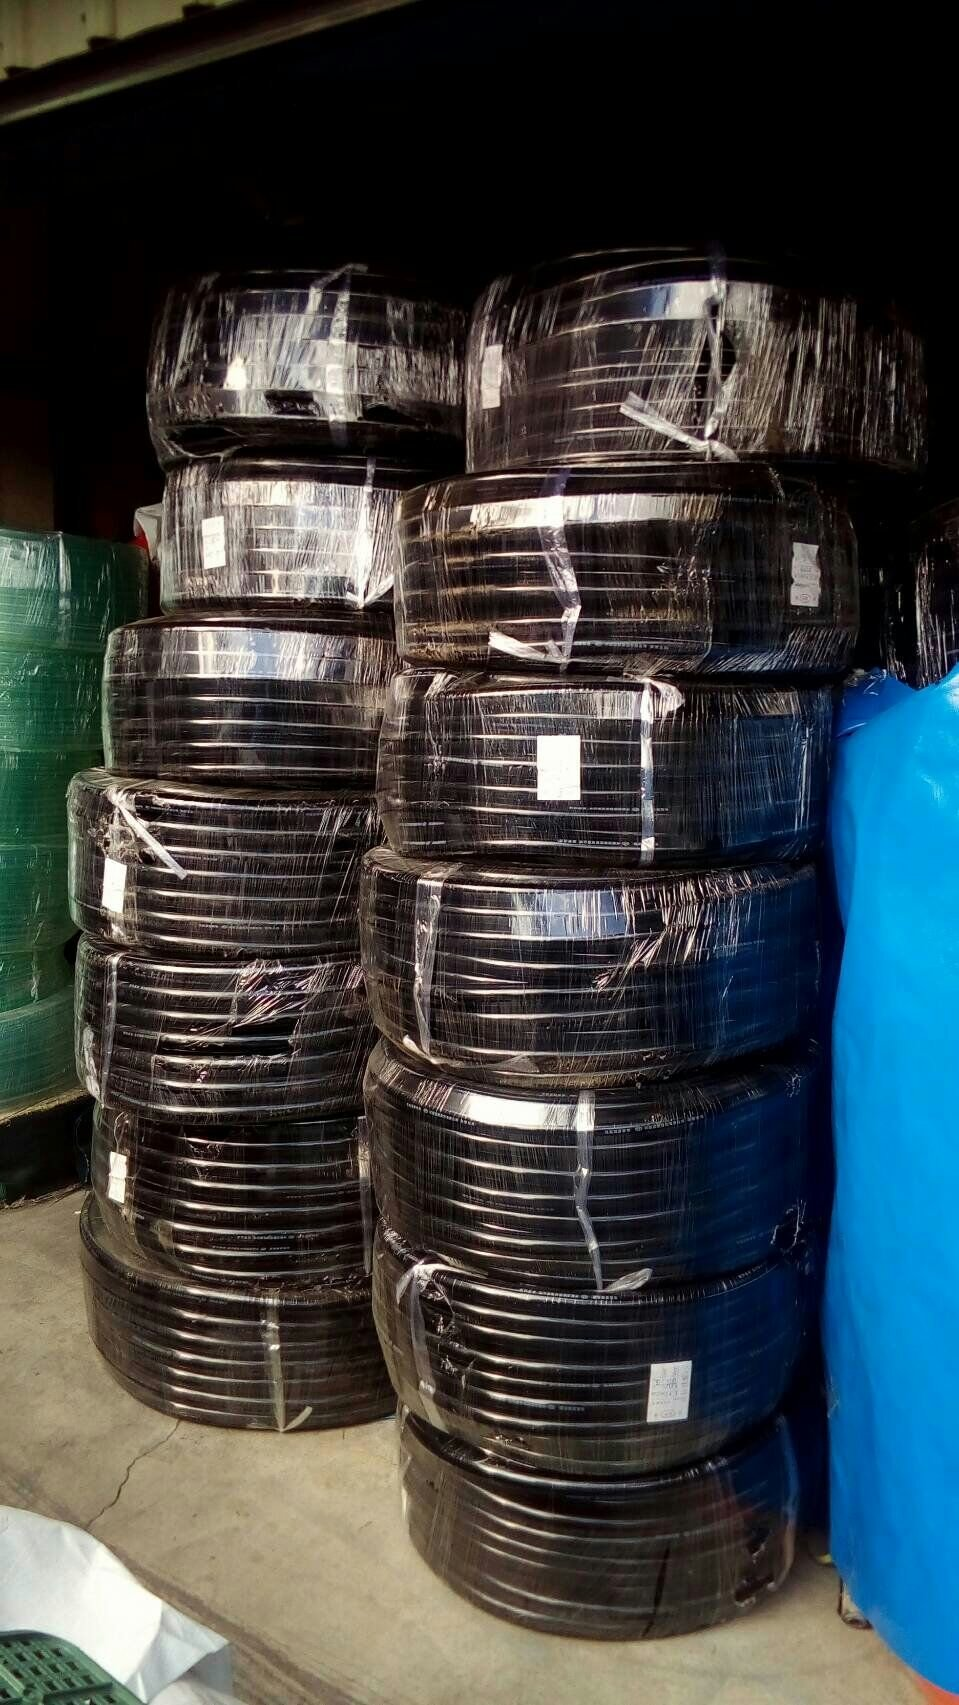 A級祥曜牌黑珠光水管園藝農用(膠管)1英吋*1捲/100米長